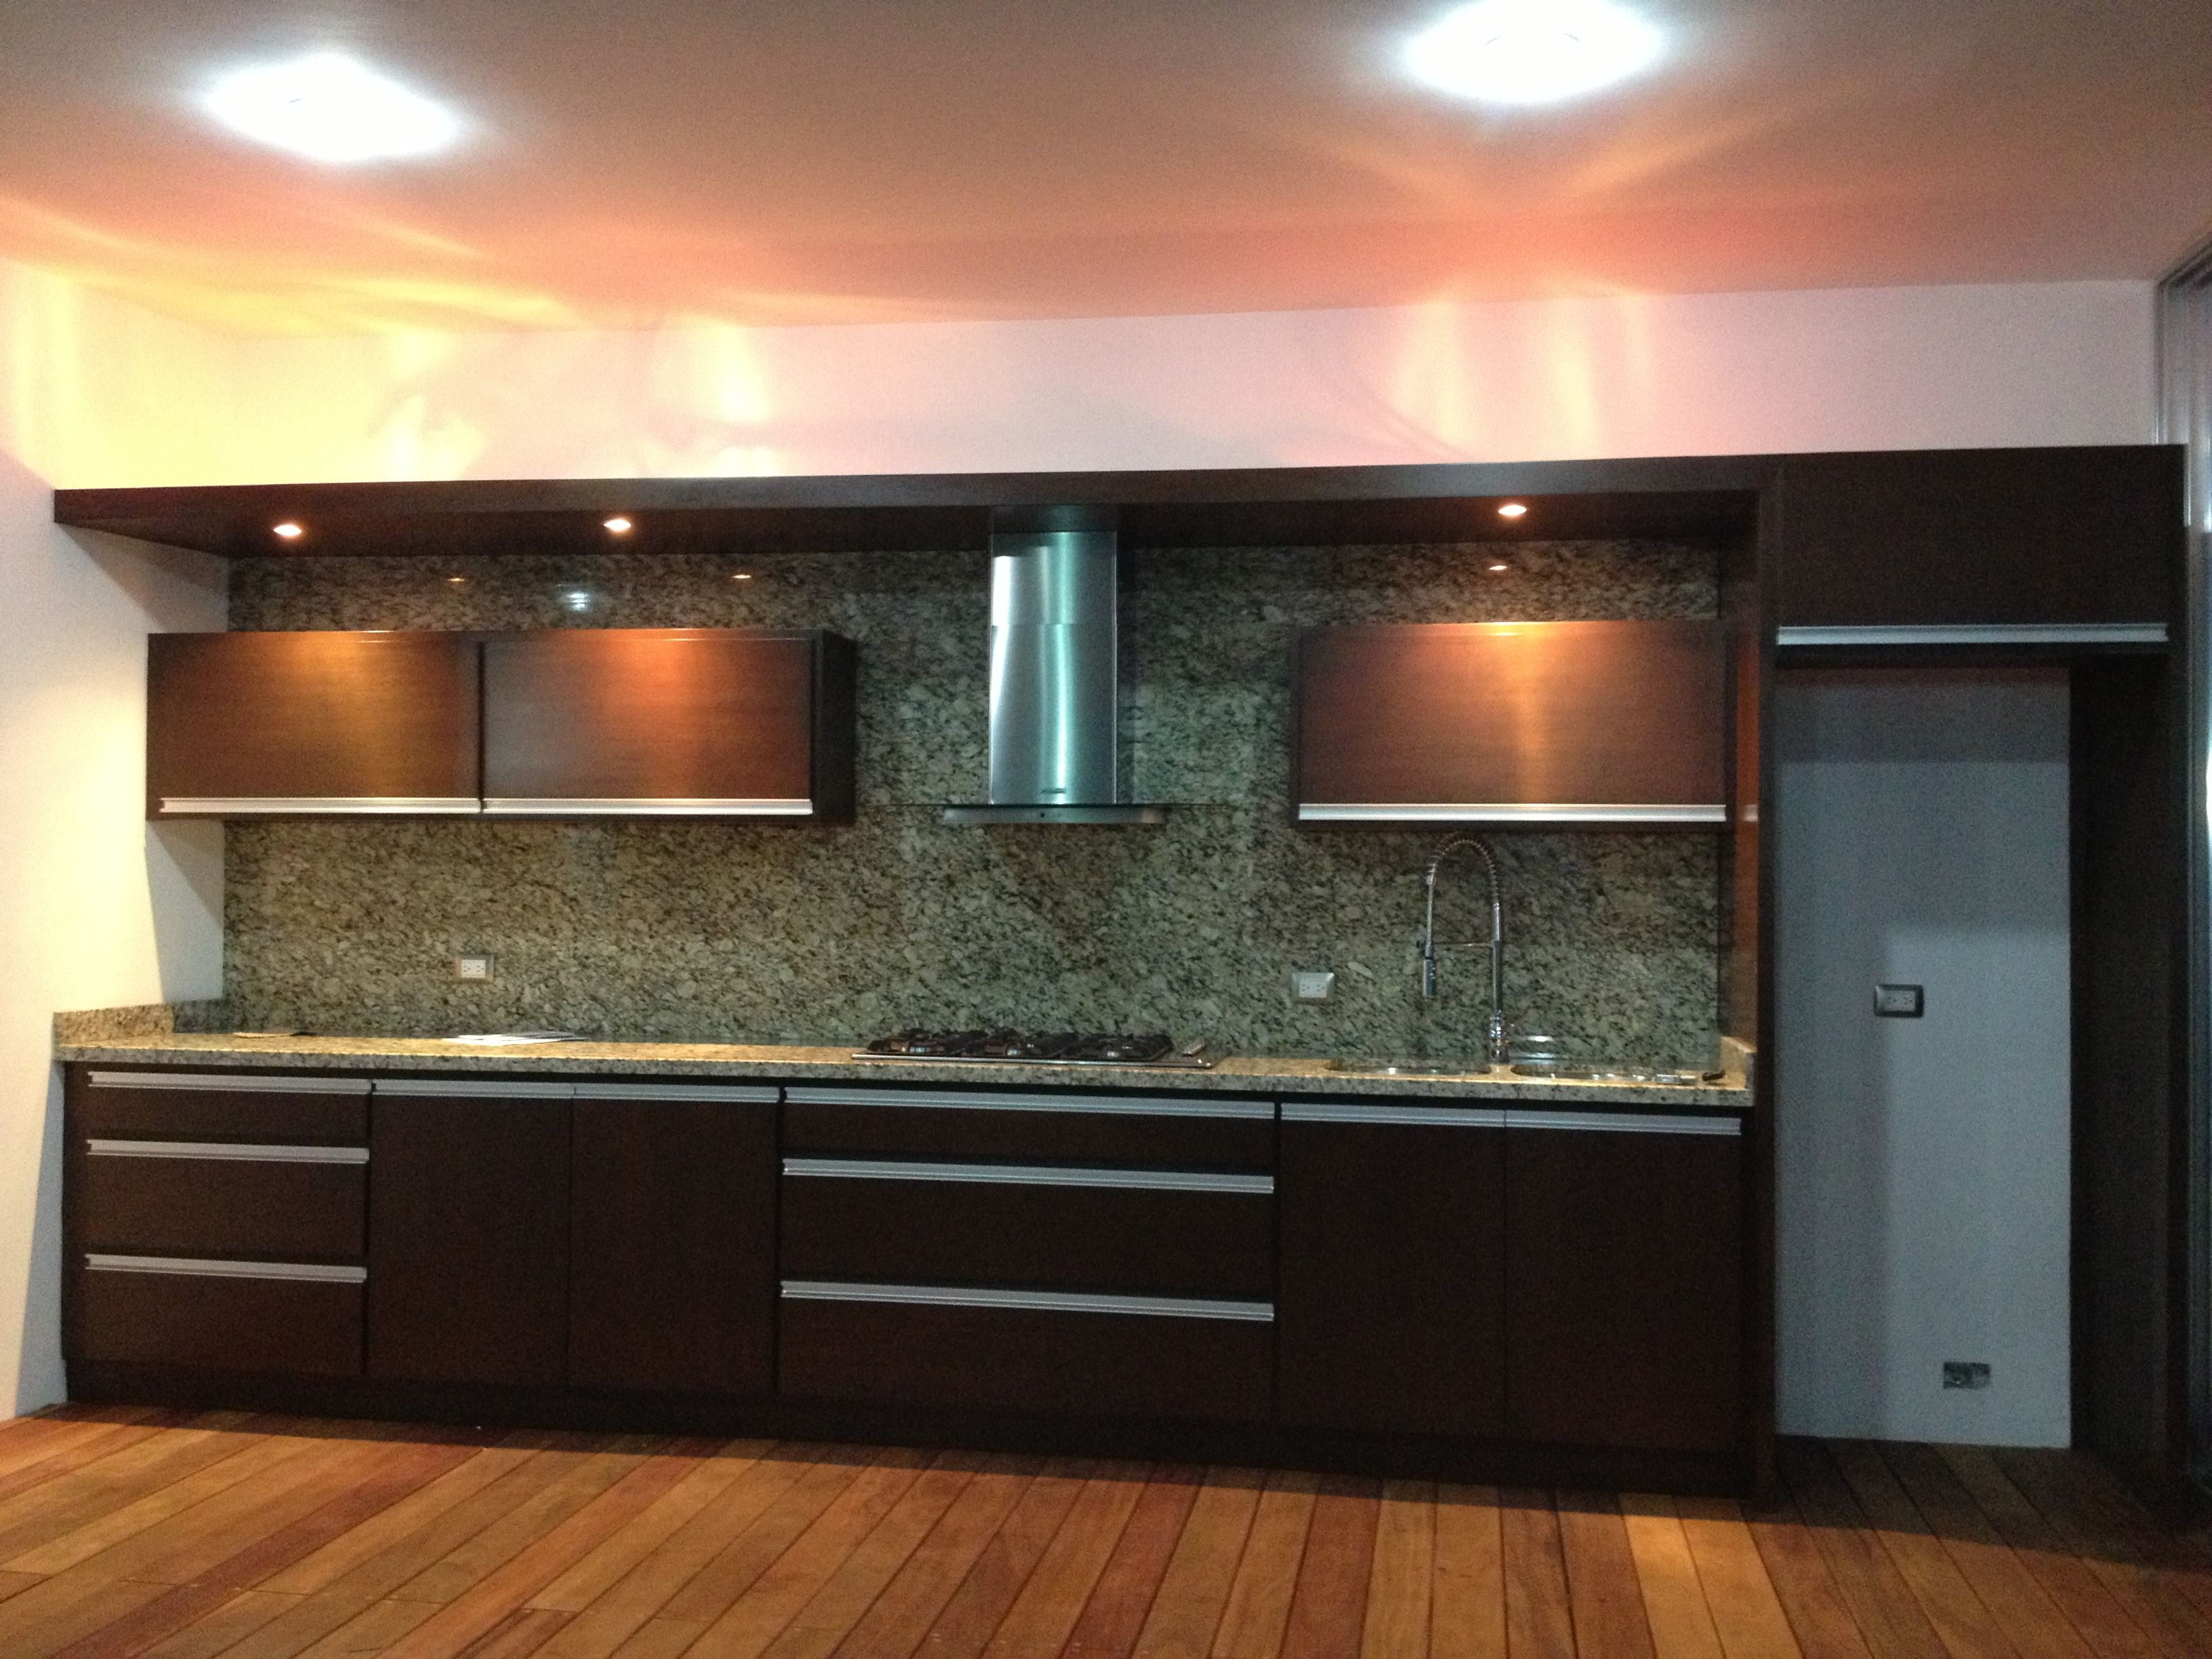 Cocina en cedro con aplicaciones de aluminio piso con for Aplicacion para disenar cocinas